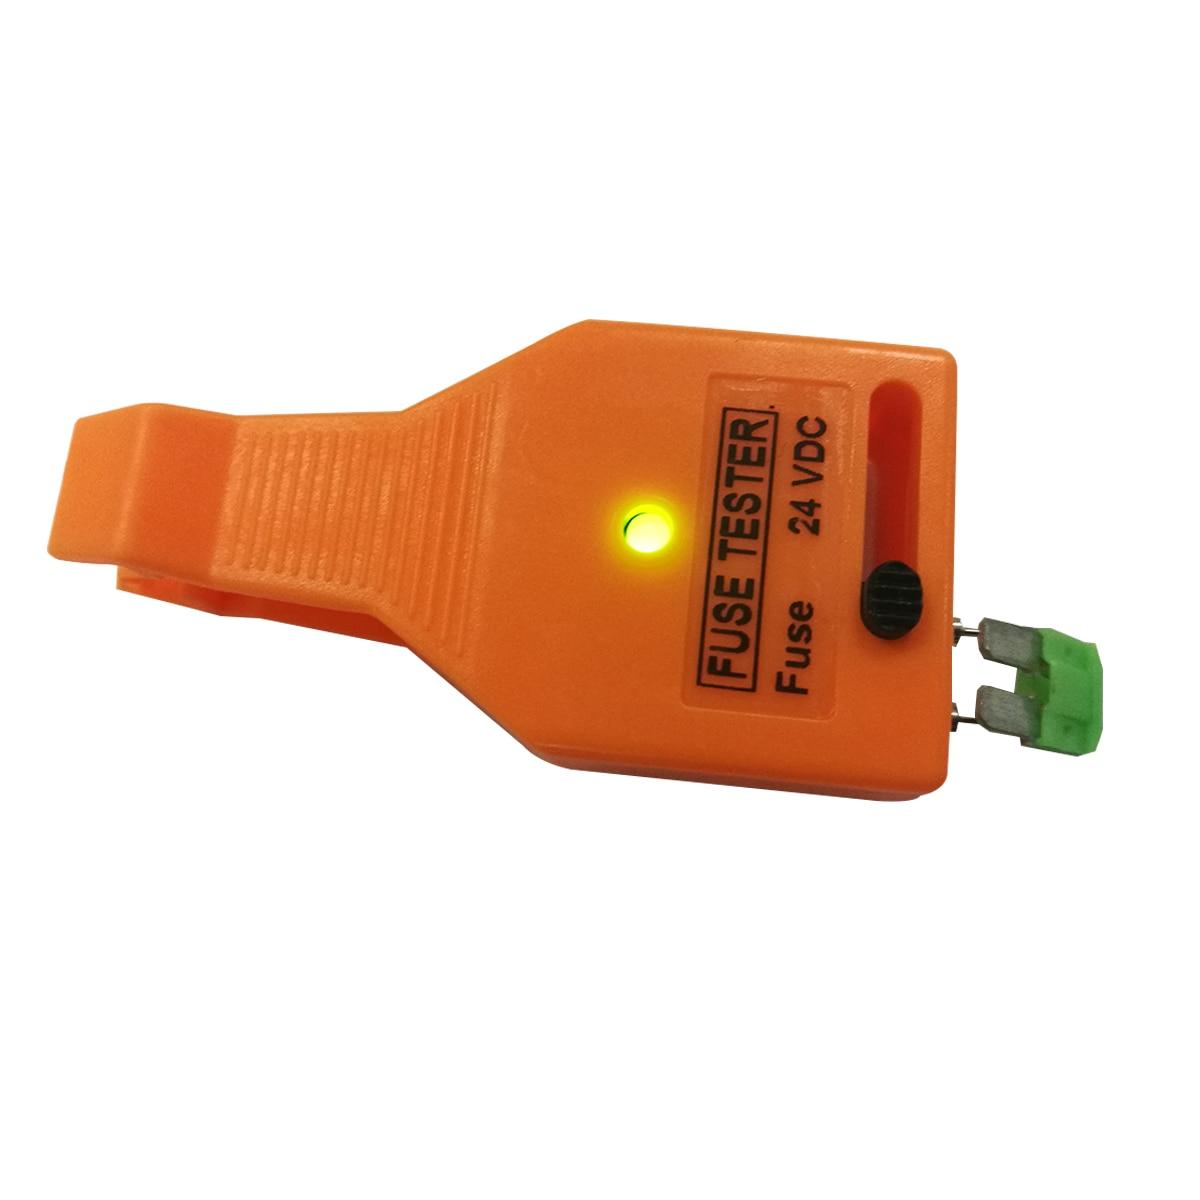 Car Automobile Blade Ato Mini Fuse Checker//Tester//Puller Insertion Removal Tool